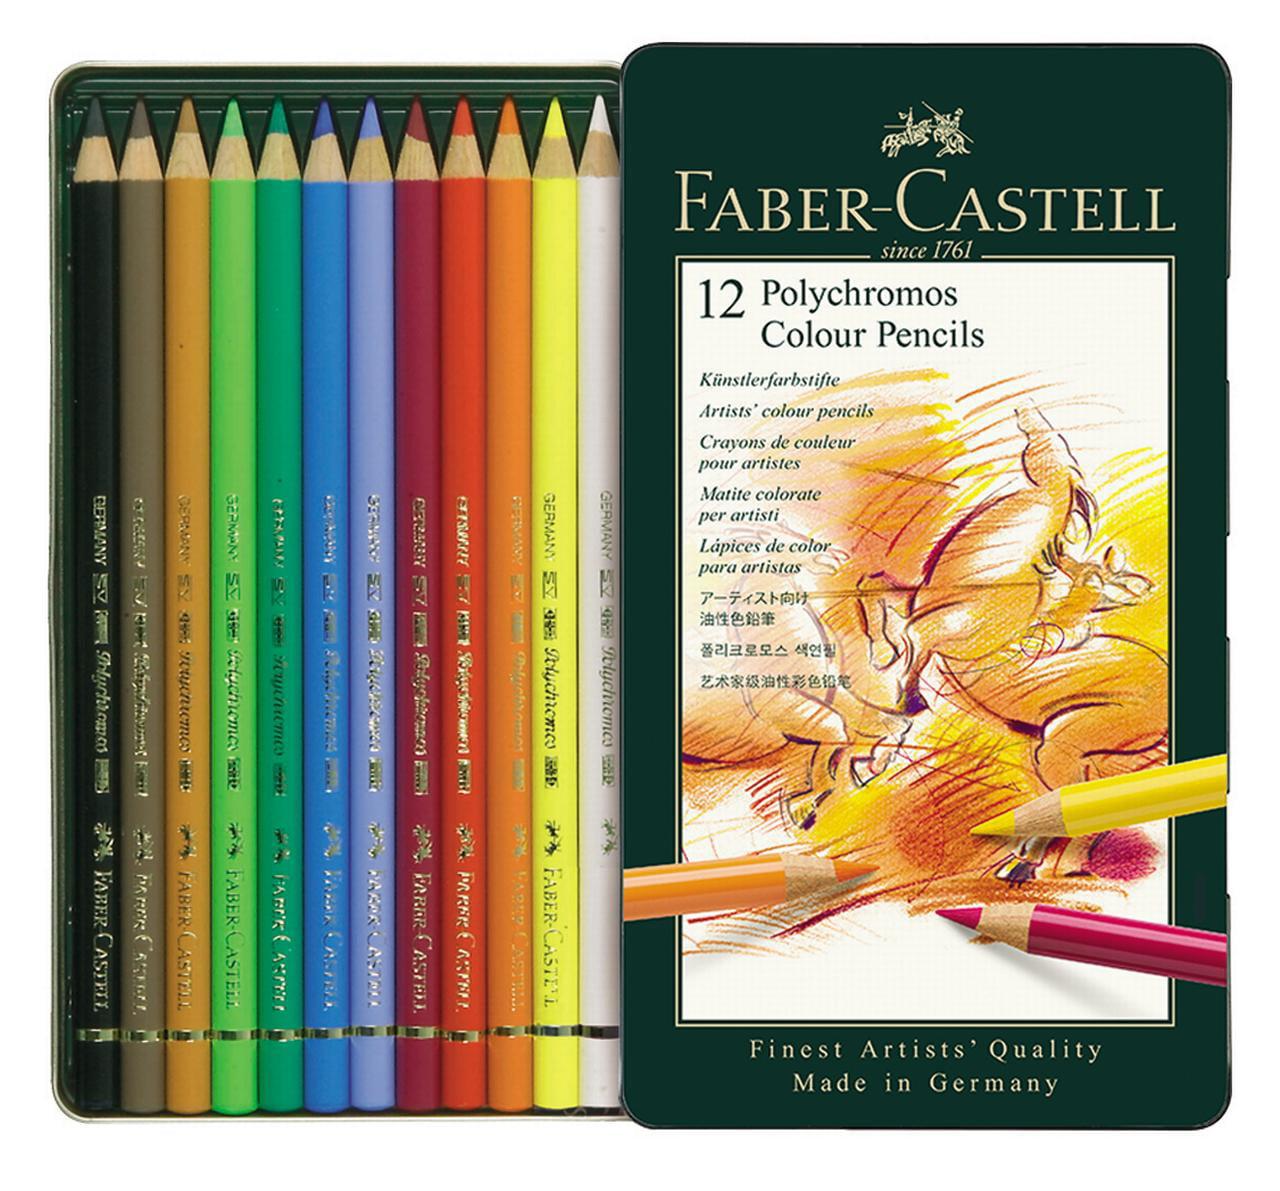 faber castell polychromos color pencils 12 colored pencils